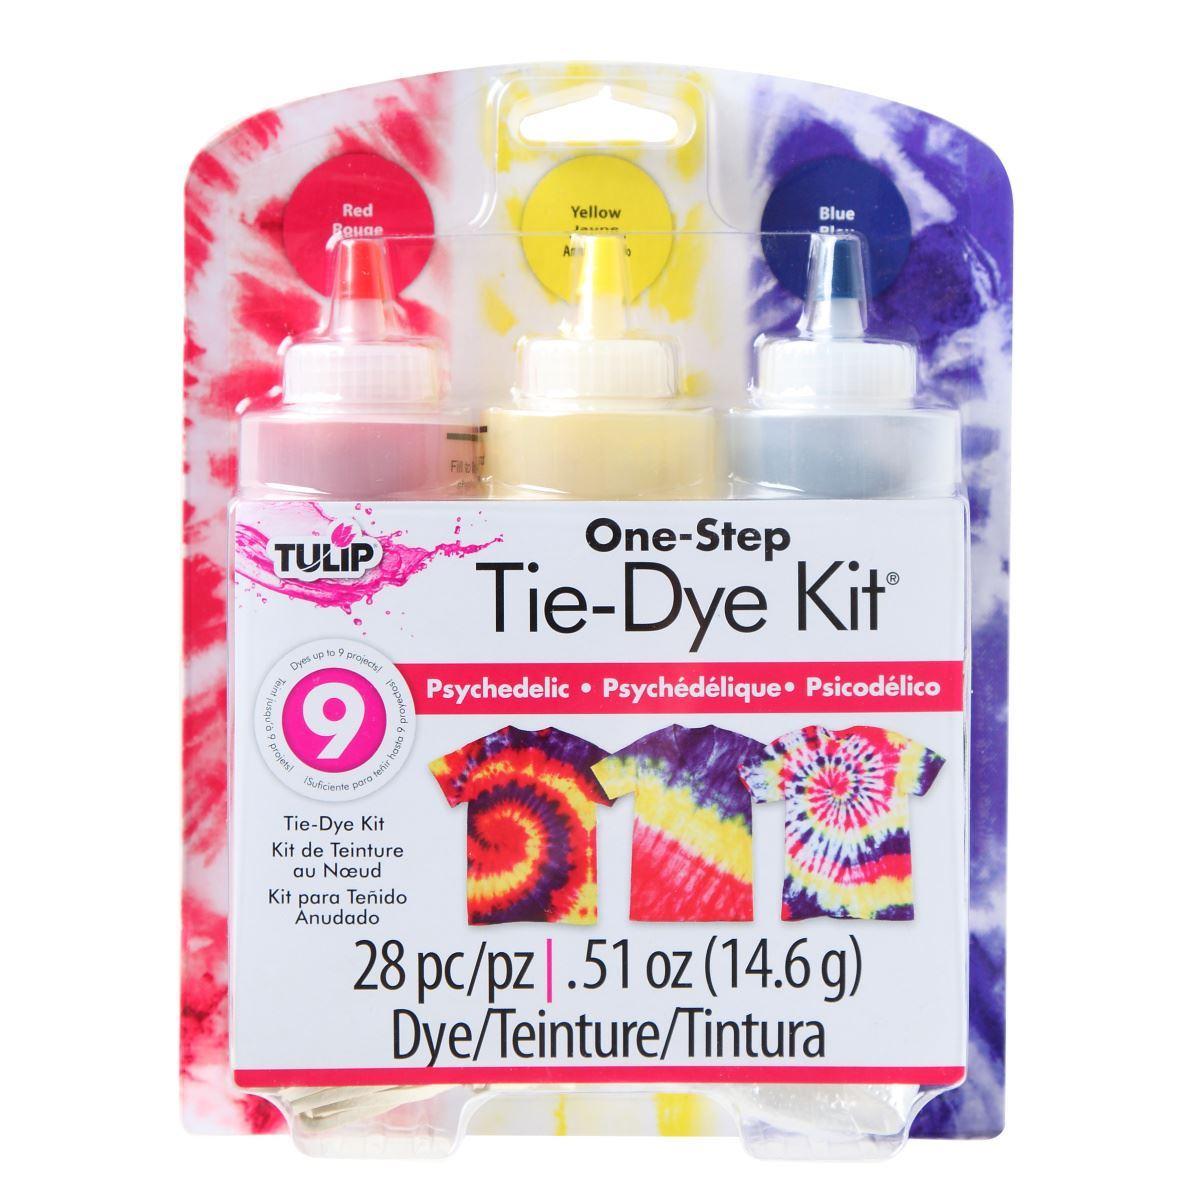 Psychedelic 3-Color Tie-Dye Kit